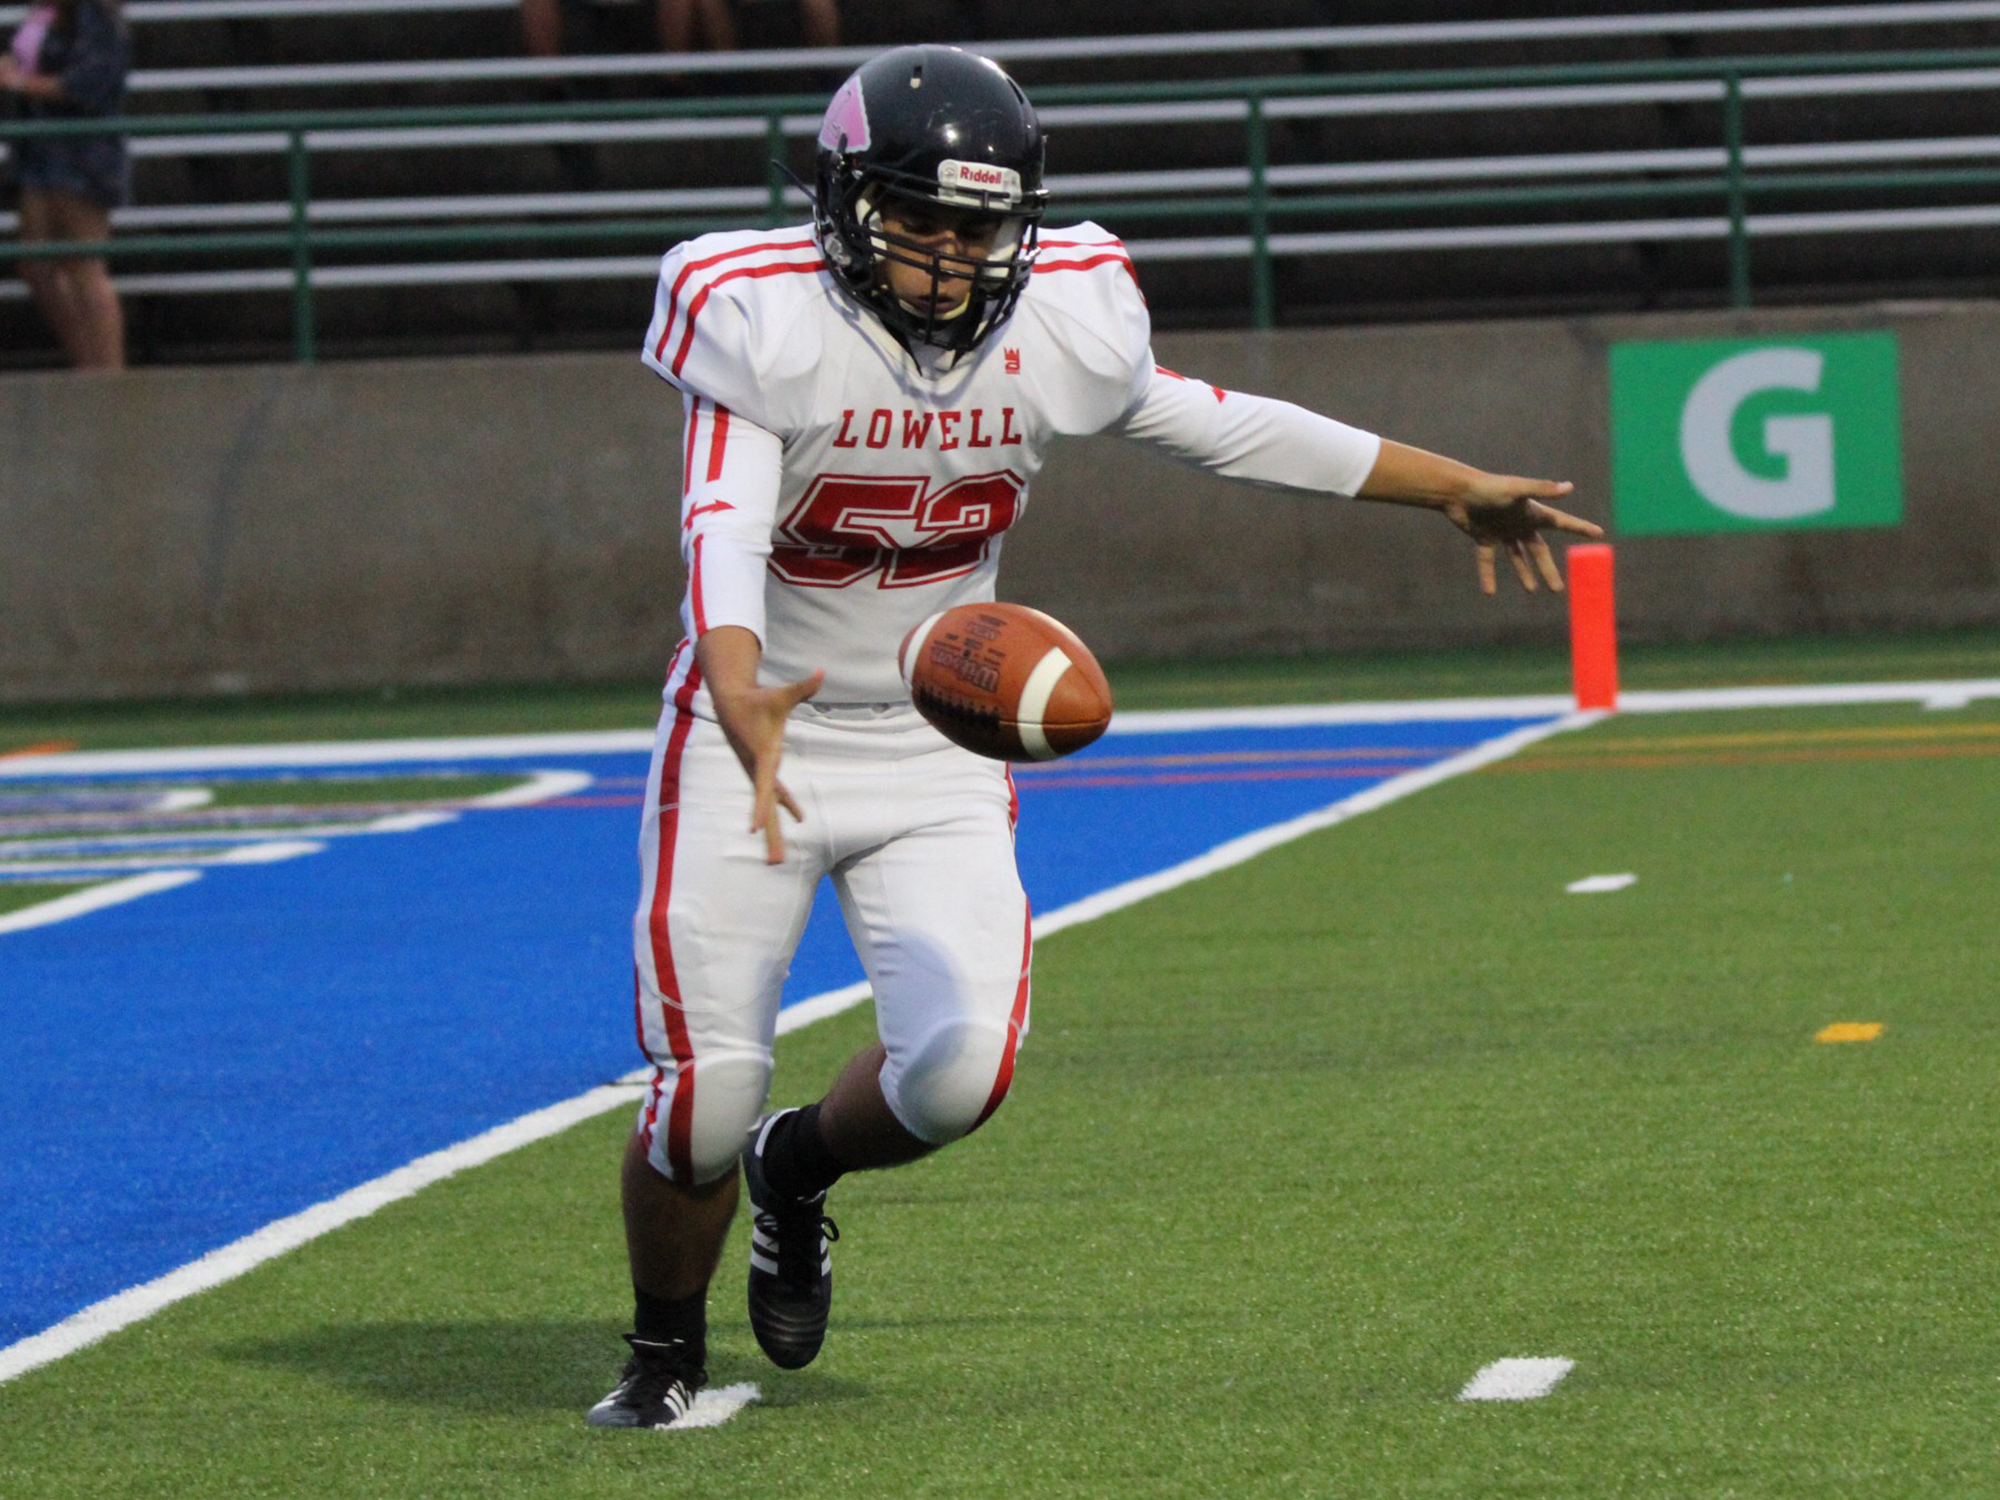 Lowell Red Arrows High School Football Uniforms